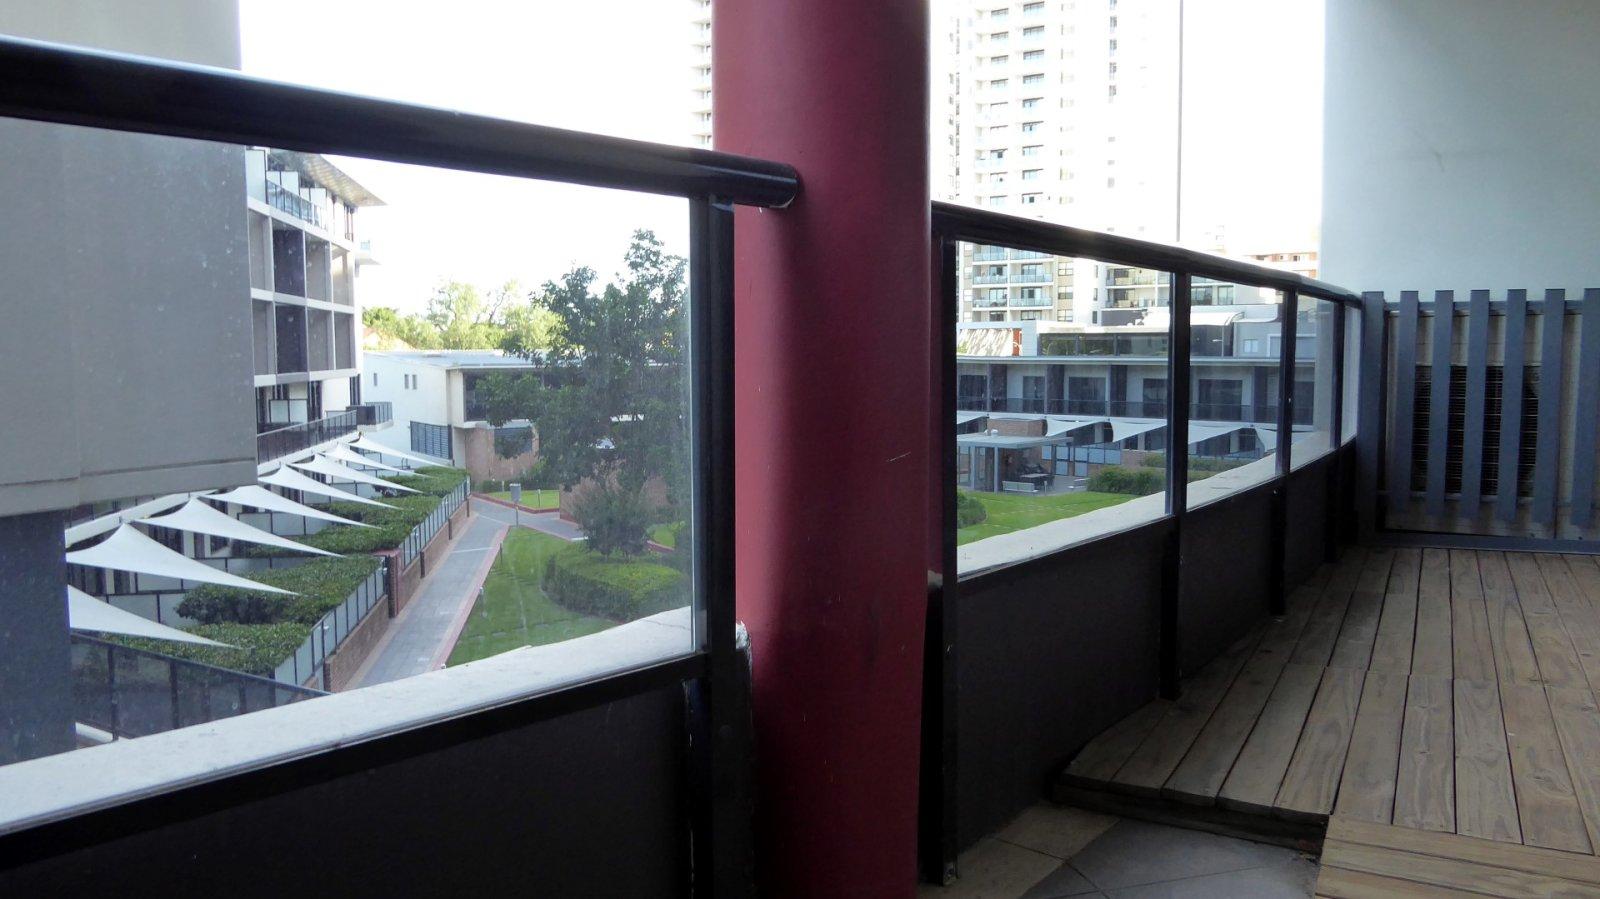 Sydney Parramatta (Meriton Apartments) - gdpcleary